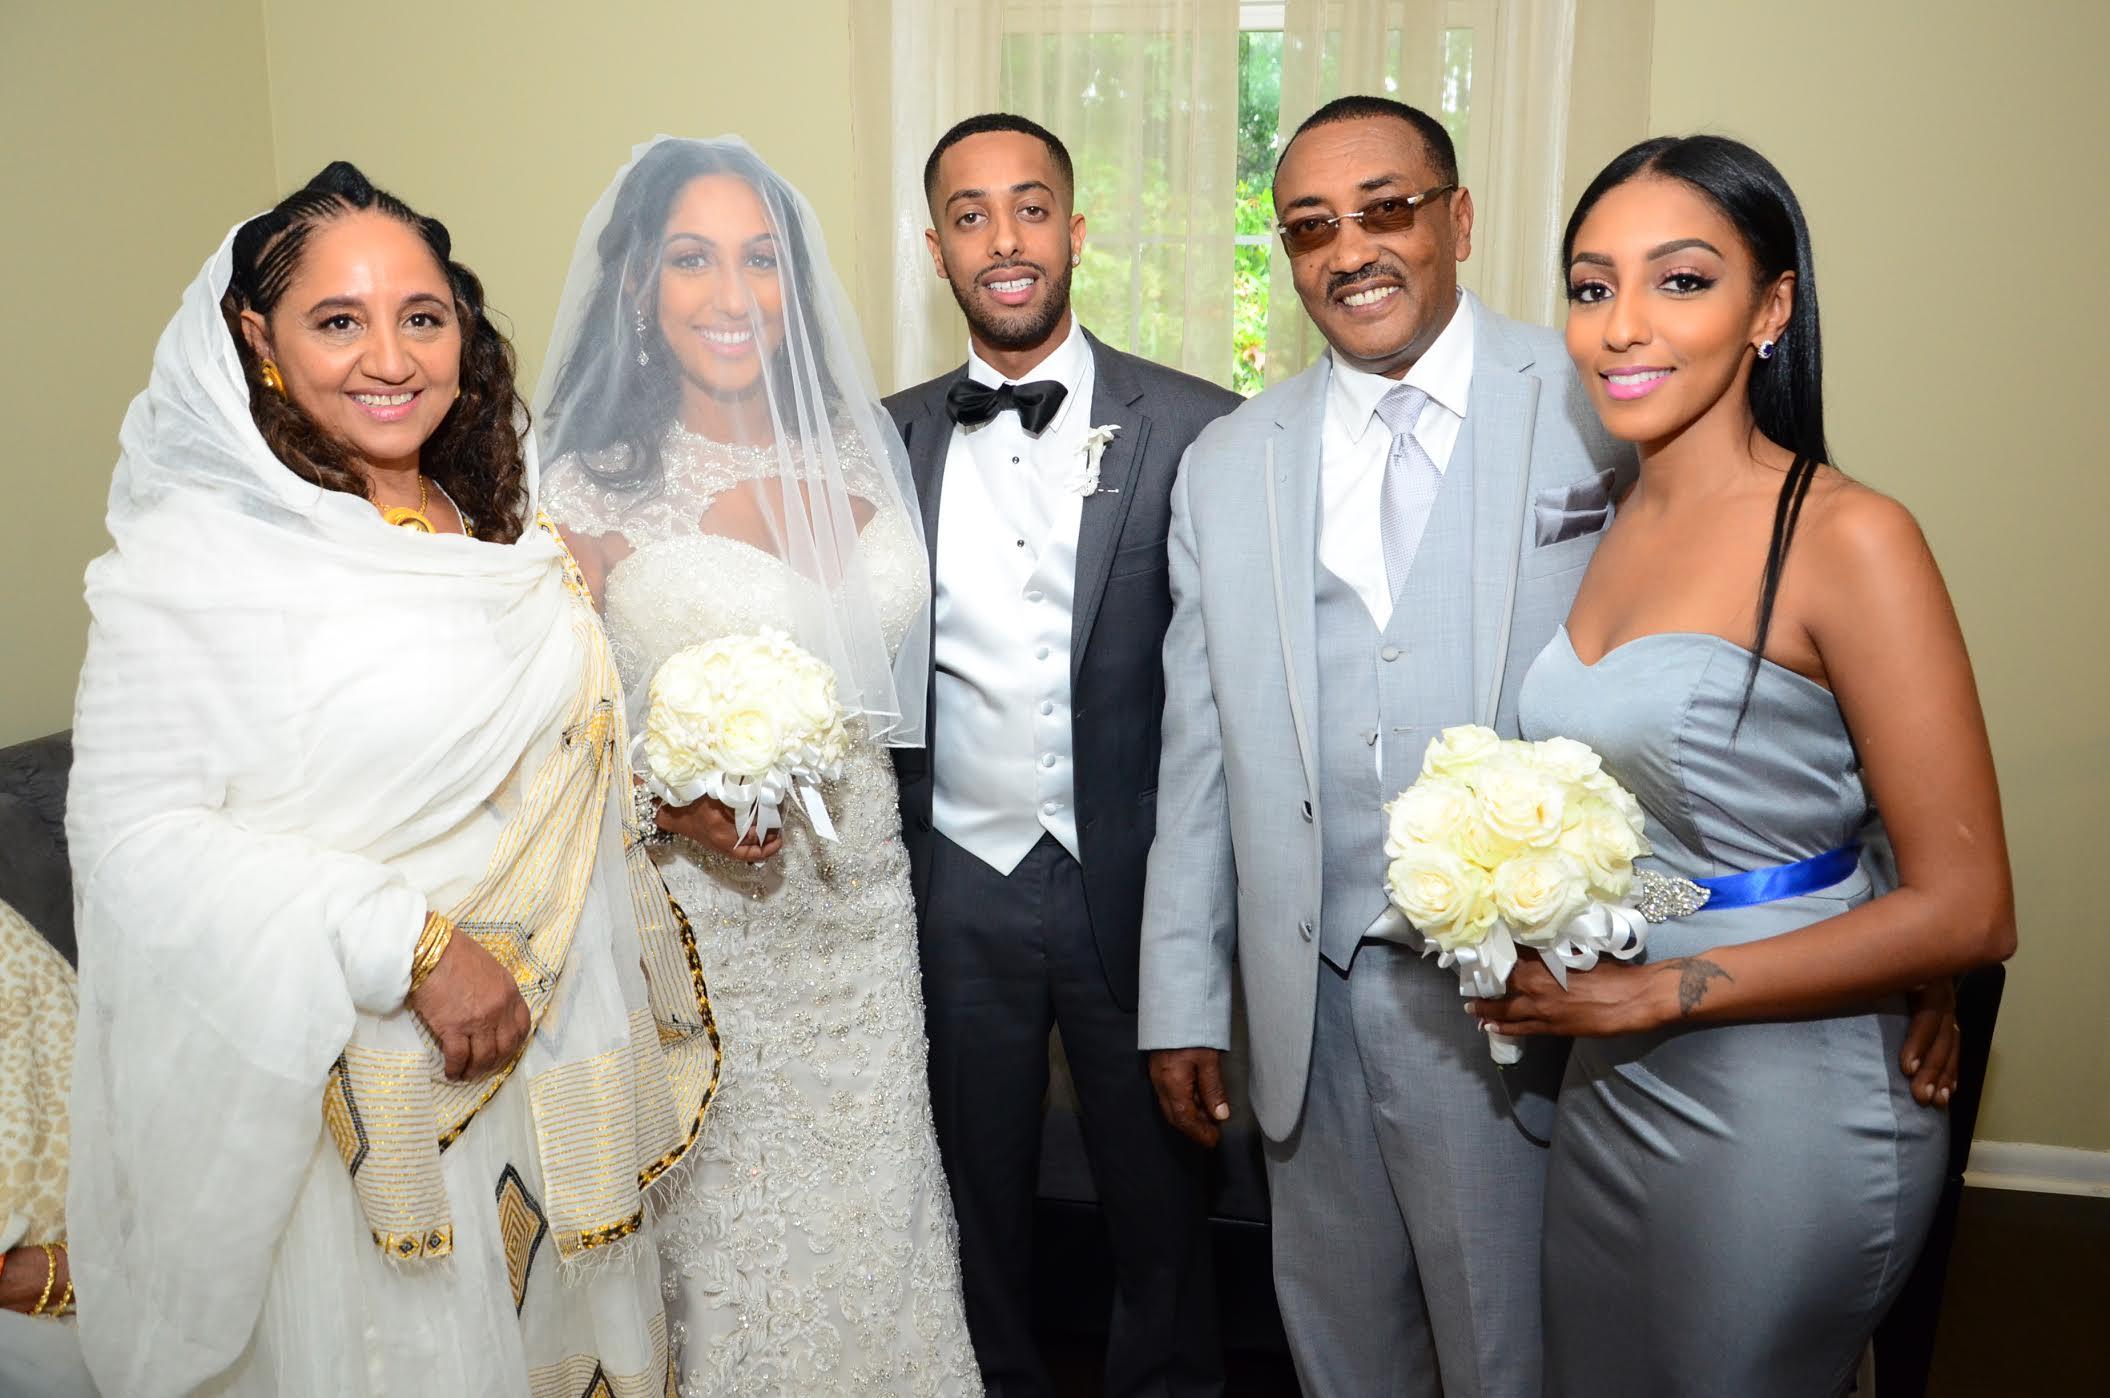 ethiopian wedding dresses ethiopian wedding dress 3 Jpg Ethiopian Traditional Wedding Dress